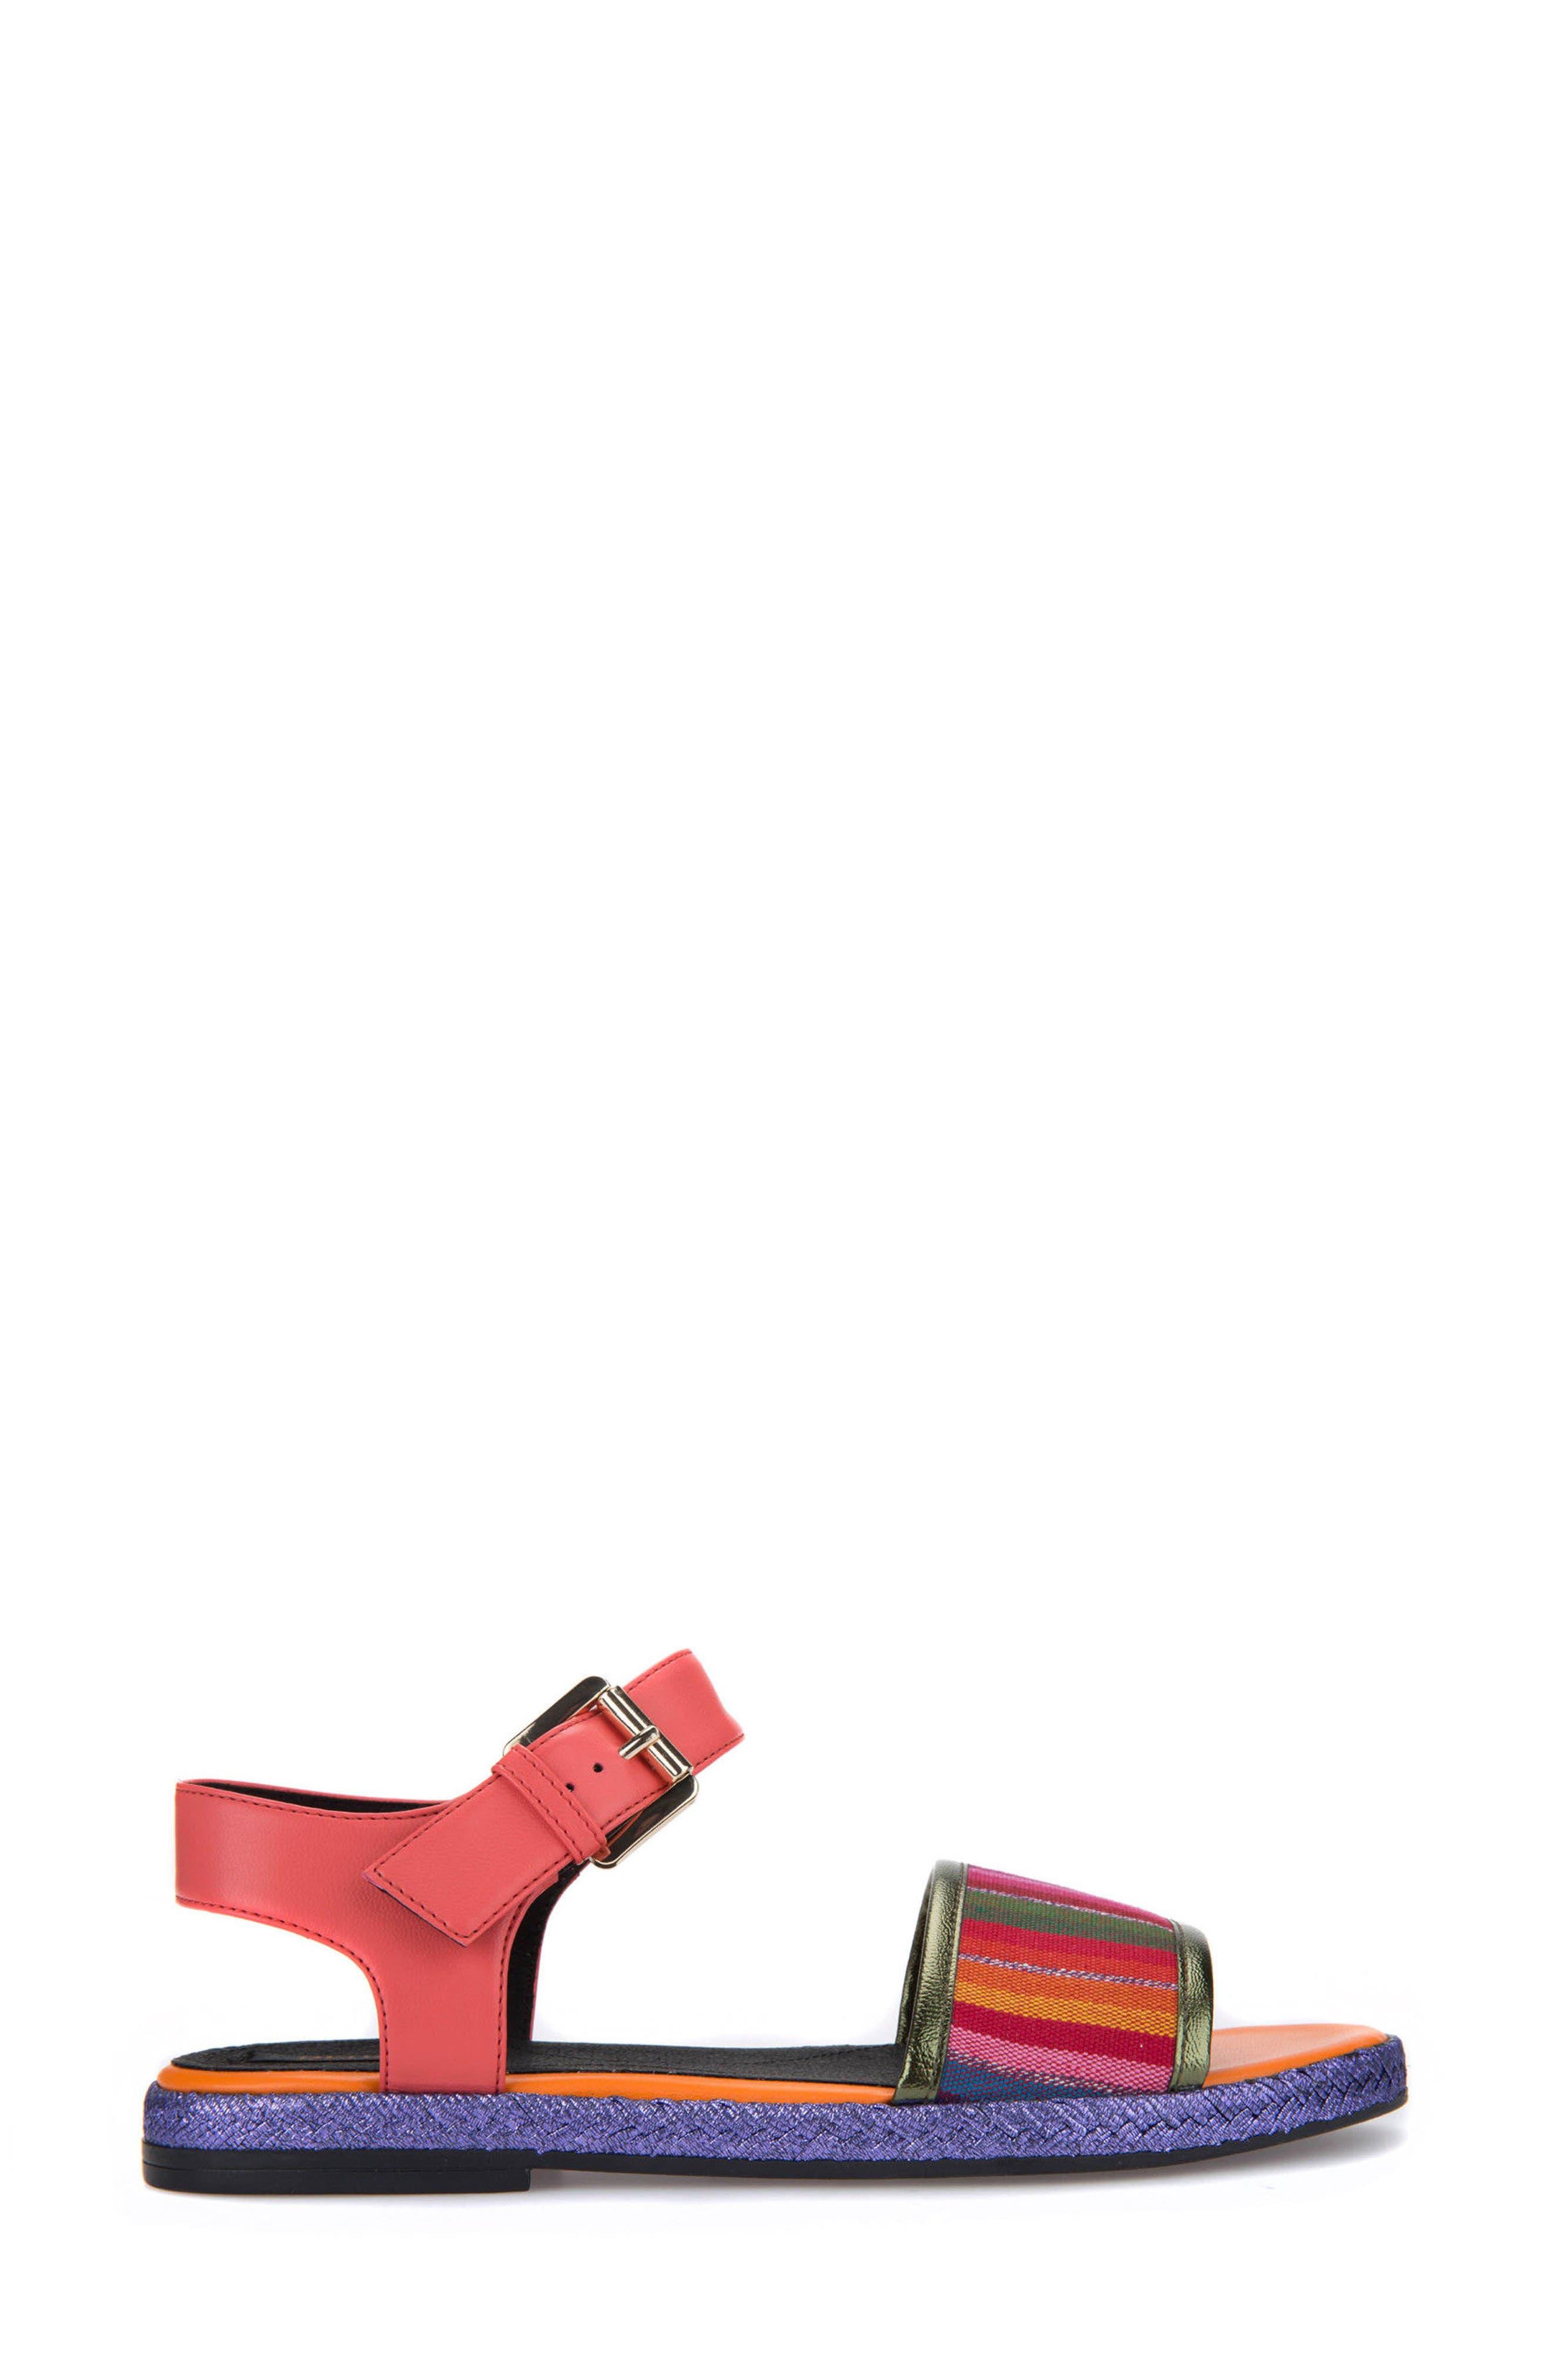 Kolleen Sandal,                             Alternate thumbnail 3, color,                             Light Purple/ Coral